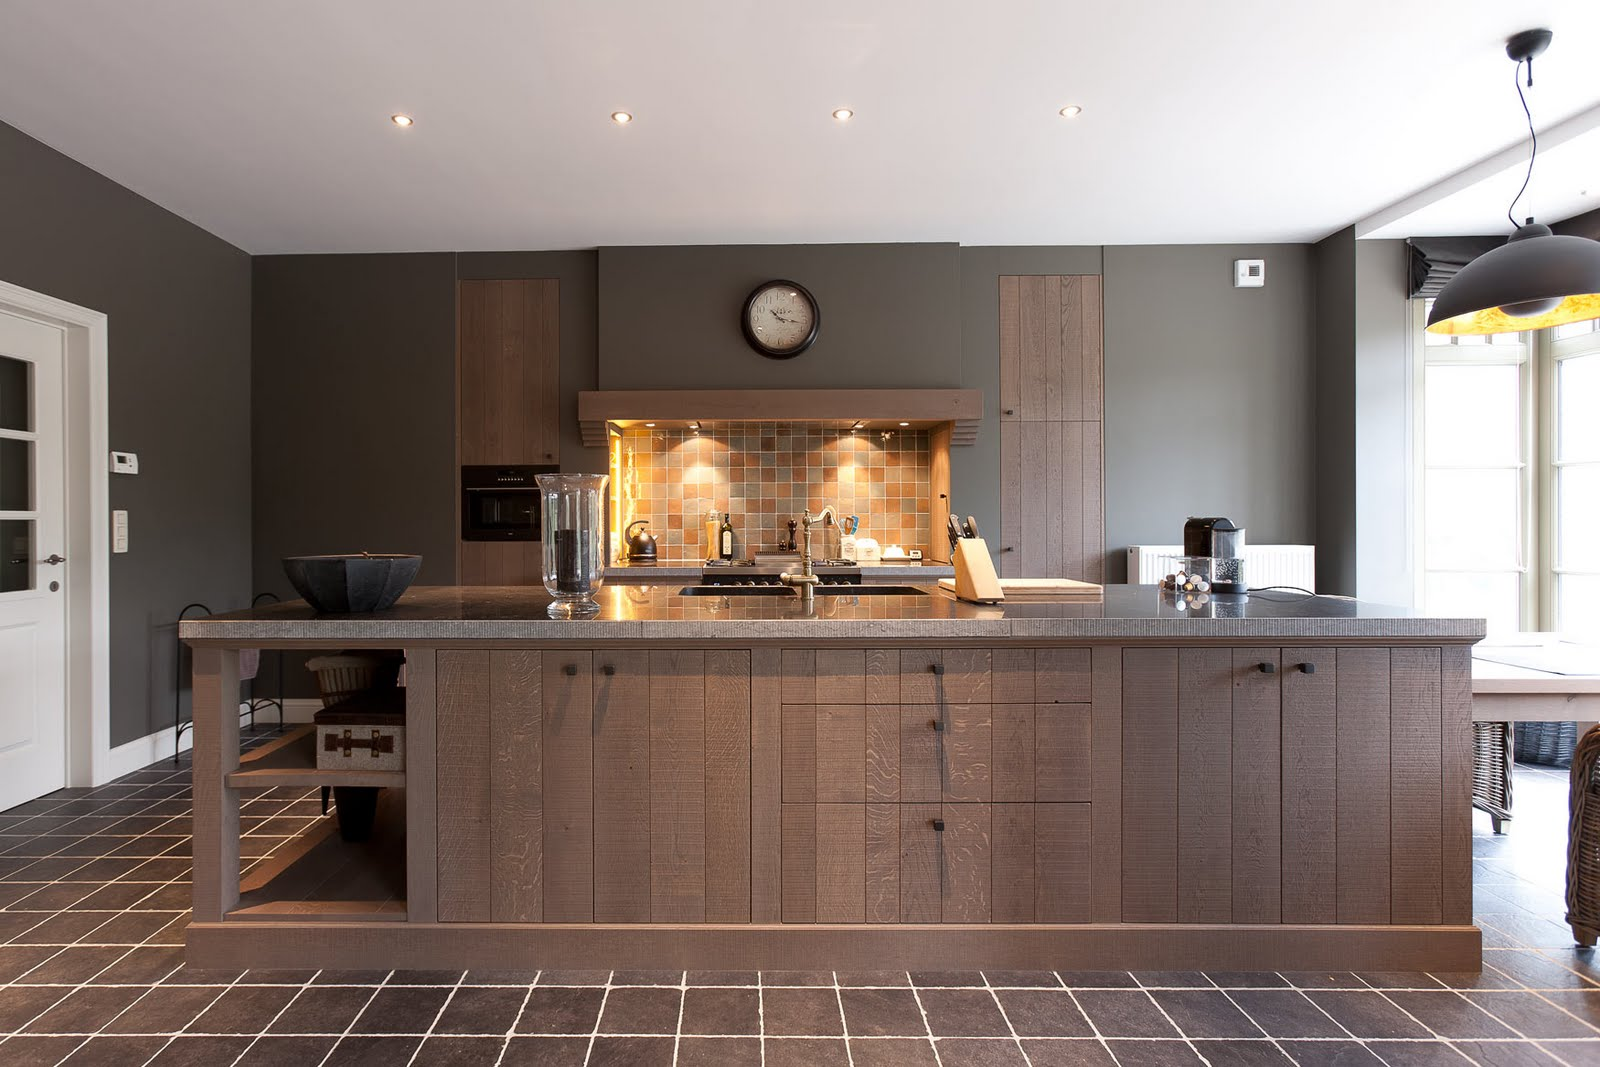 Karo home ruszamy - Fotos keukens ...